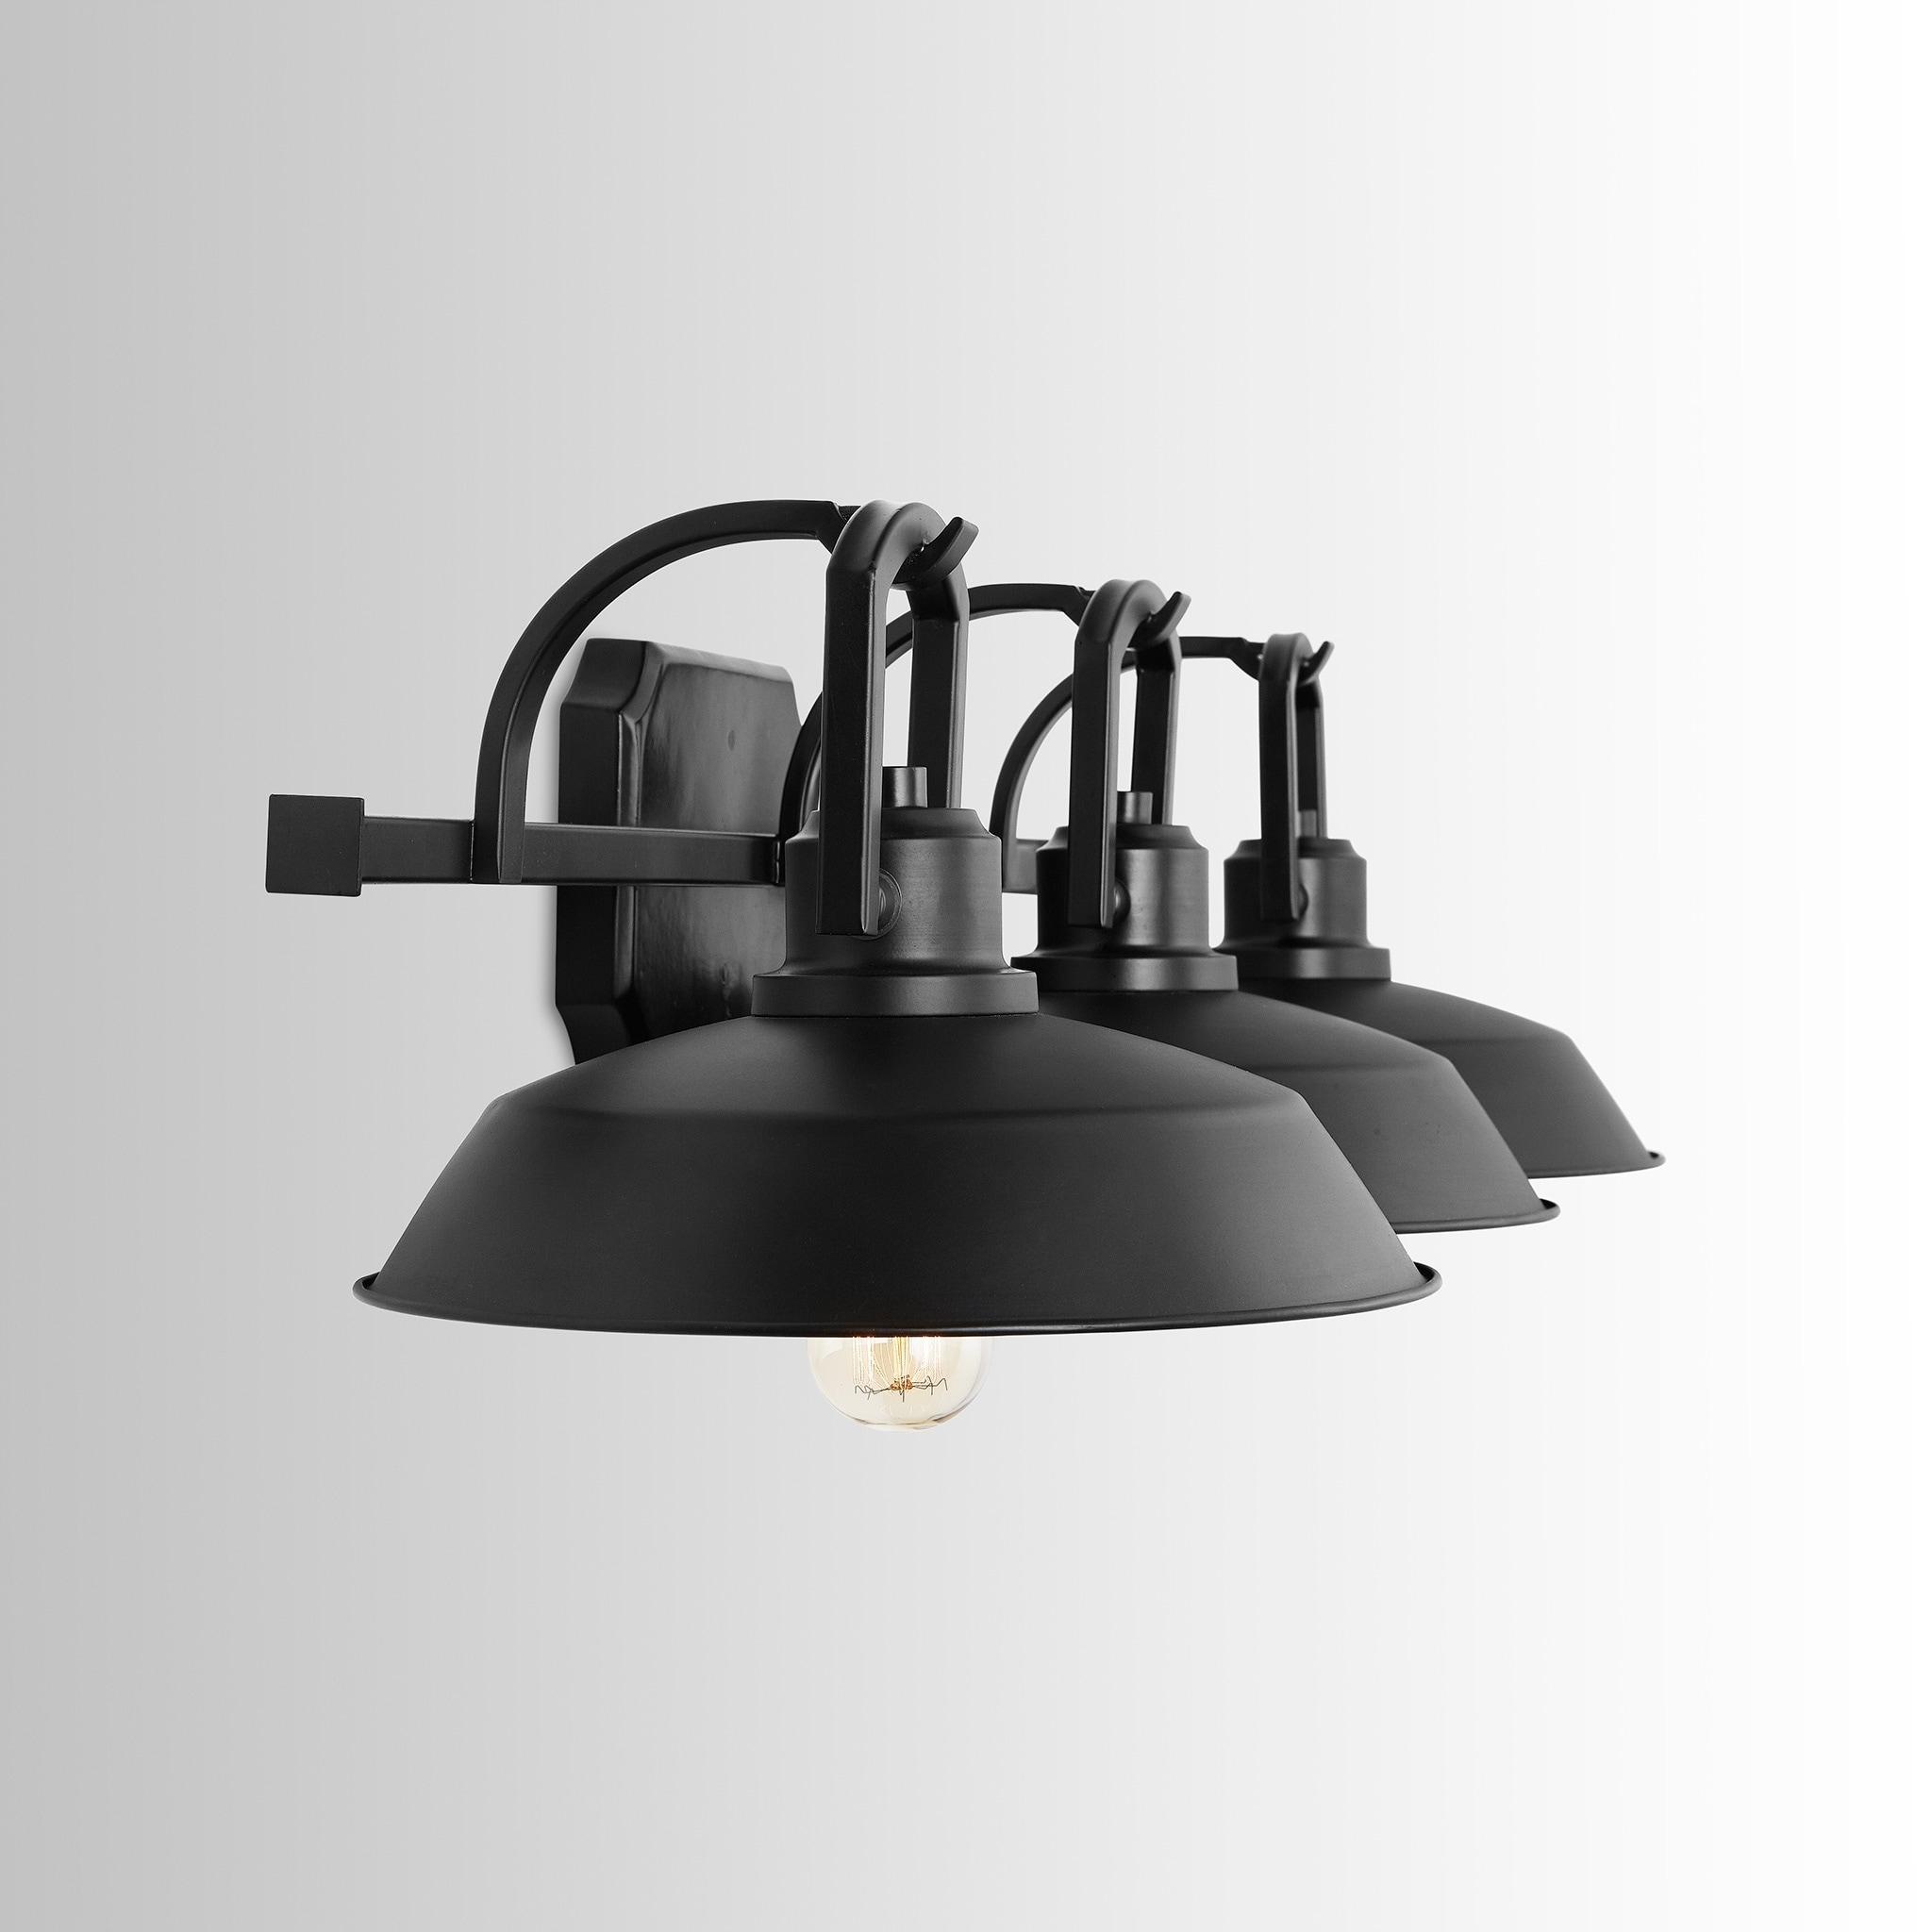 Image of: Shop Black Friday Deals On Carbon Loft Jennie 3 Light Matte Black Vanity Fixture Overstock 26284142